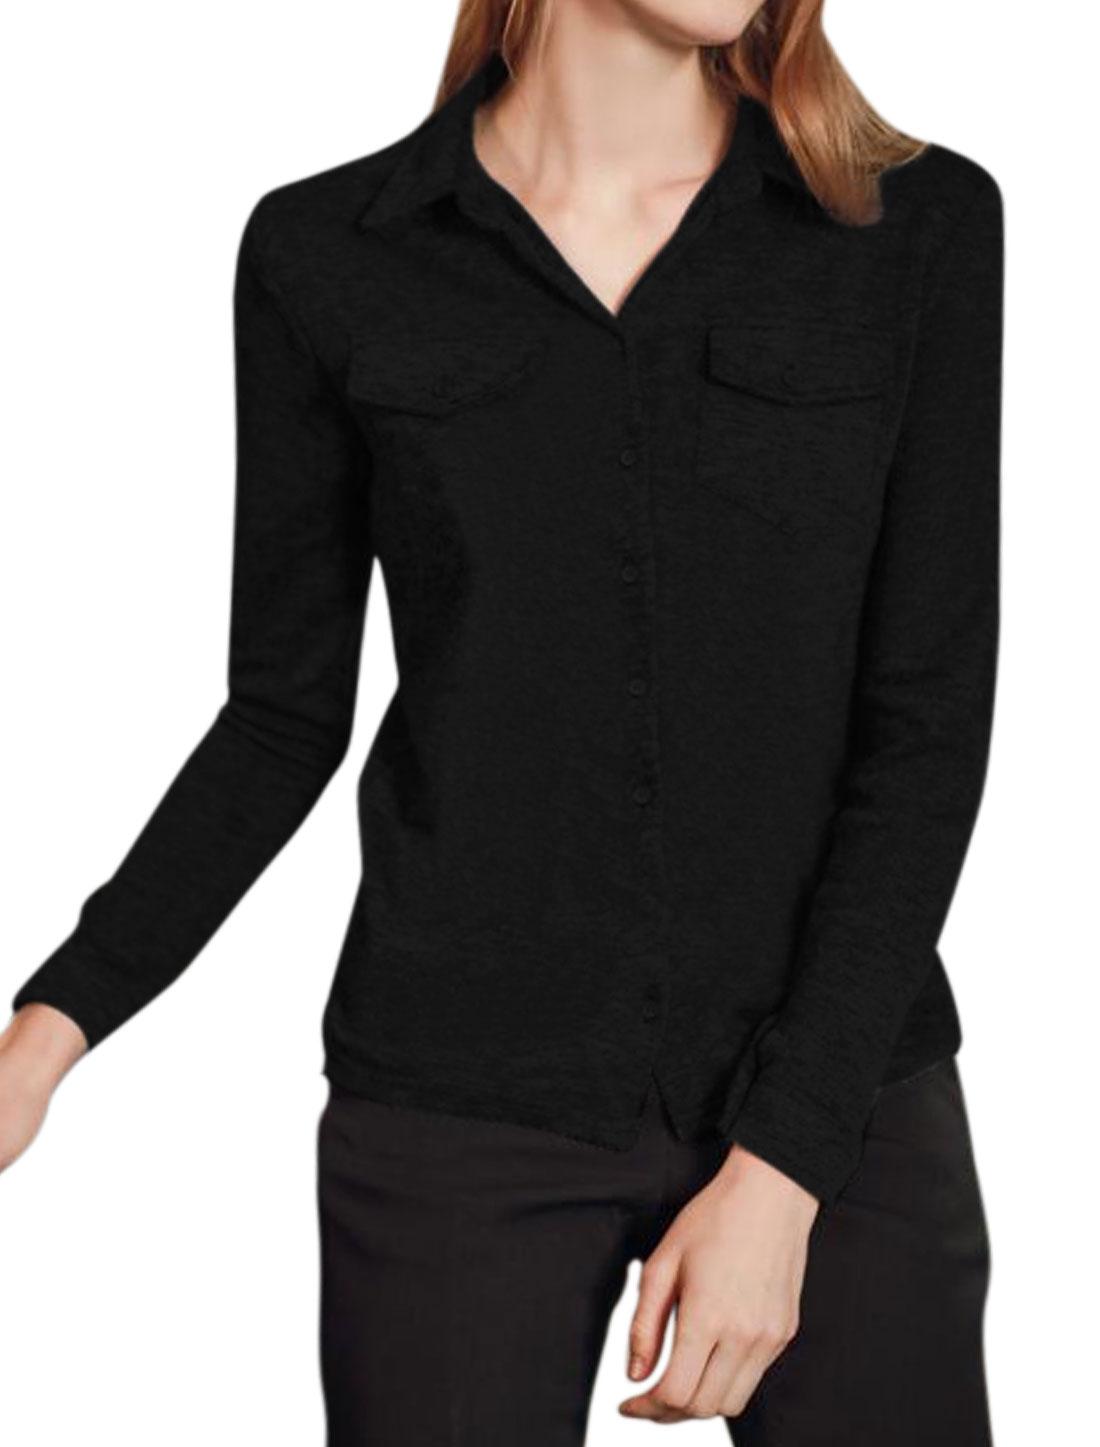 Women Flap Chest Pockets Button Closure High Low Top Black S